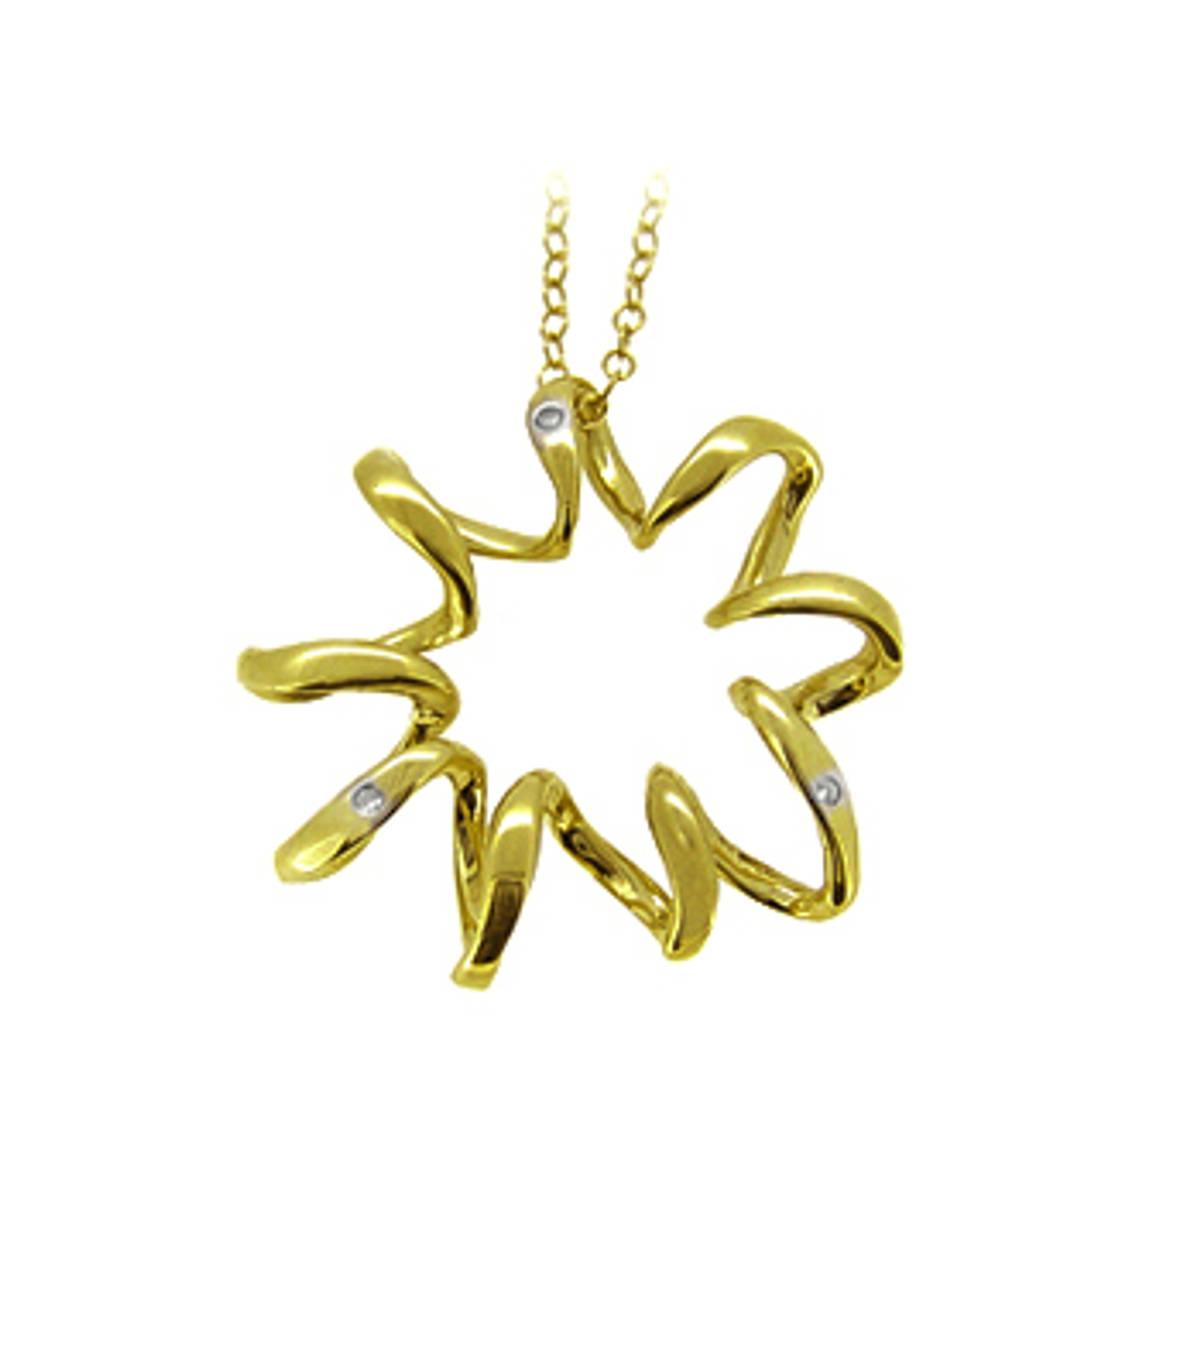 "9k yellow gold 3st CZ zig-zag circular pendant on 9k yellow gold 18"" chain Metal: 9k yellow gold9k yellow gold 18"" chain Length  2.5cm  Width  2.5cm Made in Ireland"